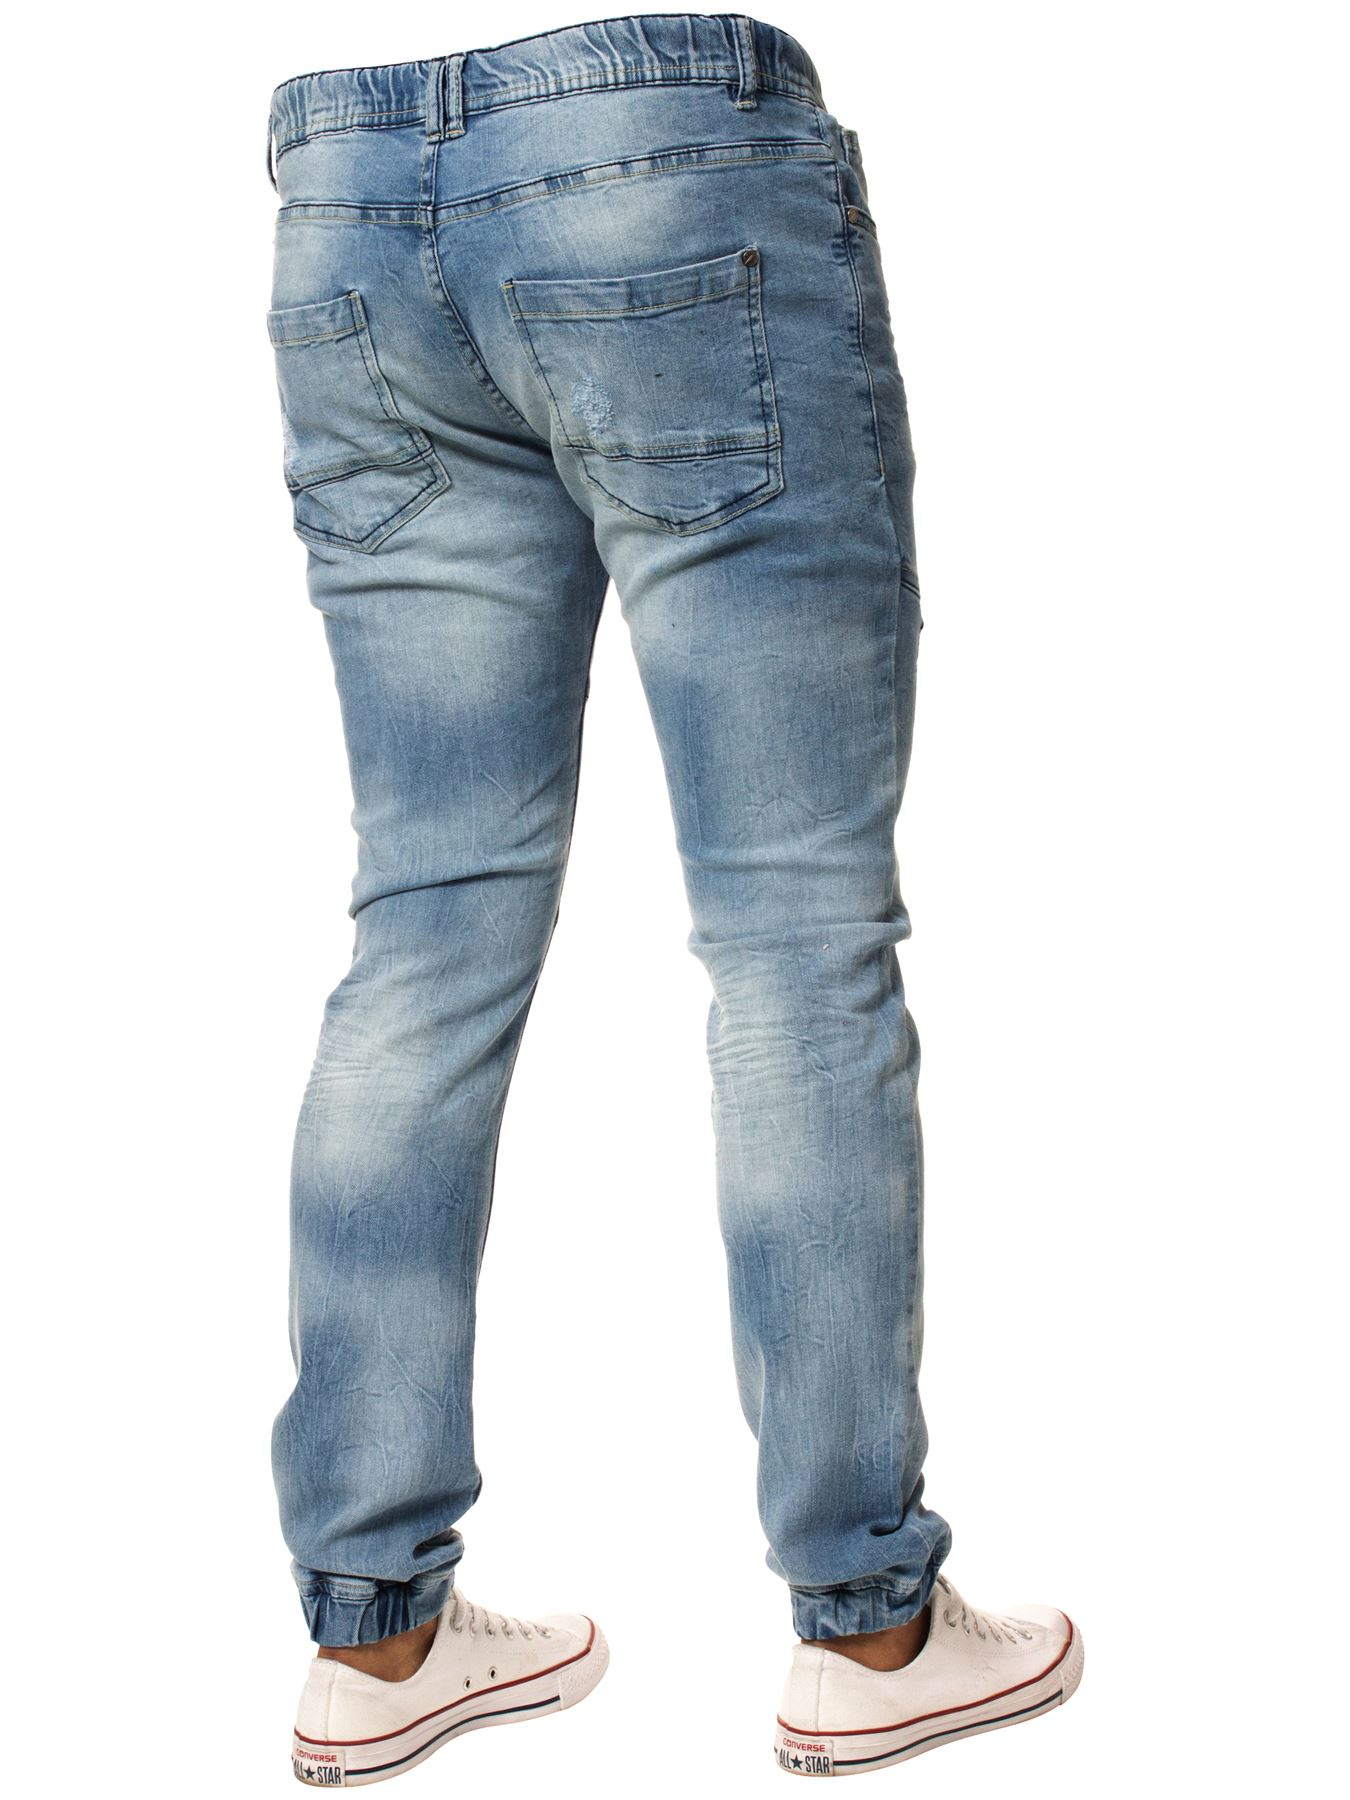 Enzo-Mens-Cuffed-Jeans-Stretch-Fit-Ripped-Denim-Jogger-Pants-Big-Tall-All-Waists thumbnail 11